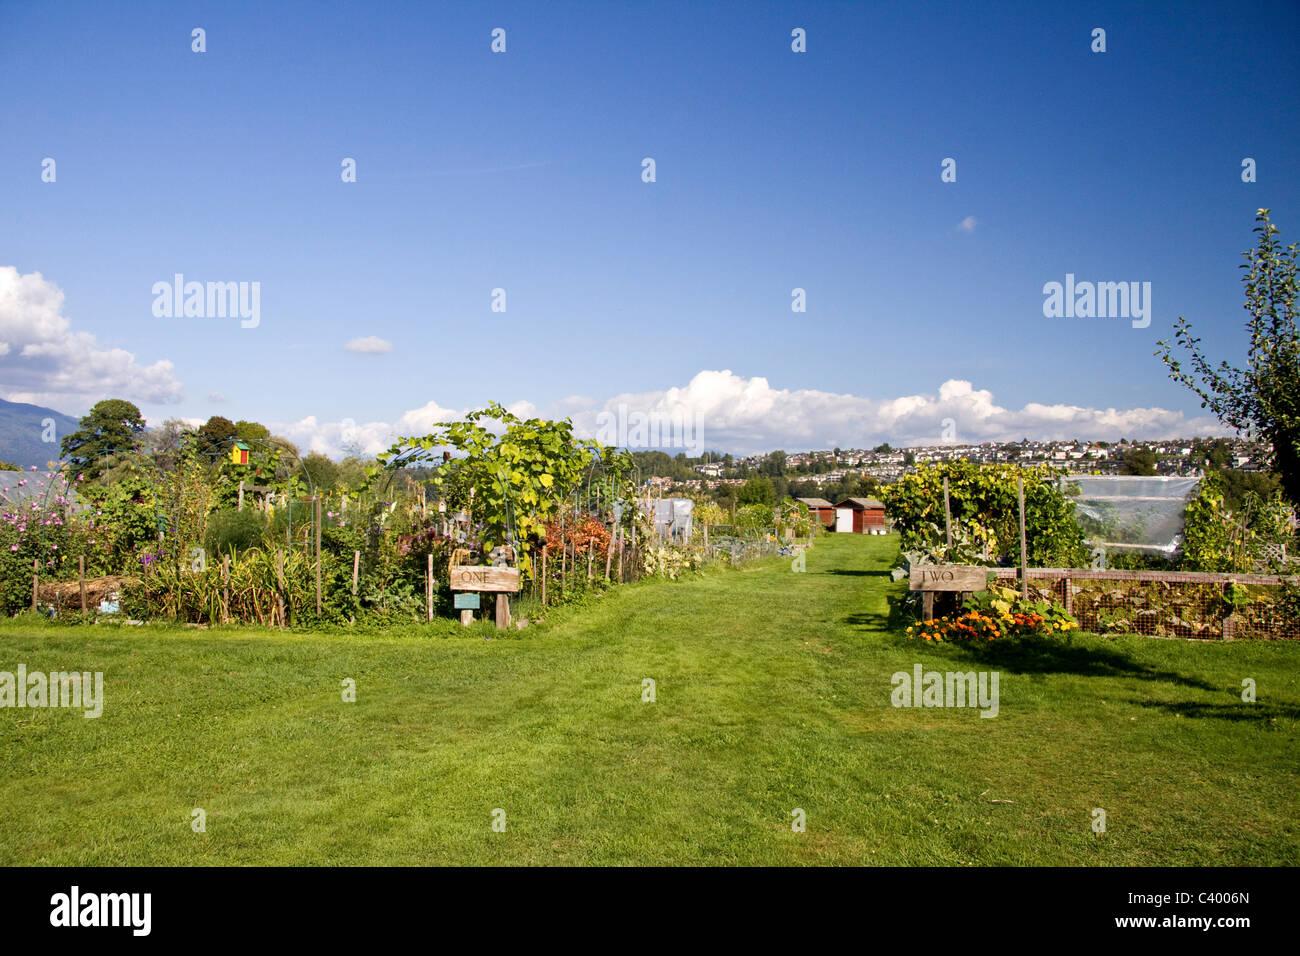 rows of garden plots at suburban community garden colony farm regional park port coquitlam bc canada